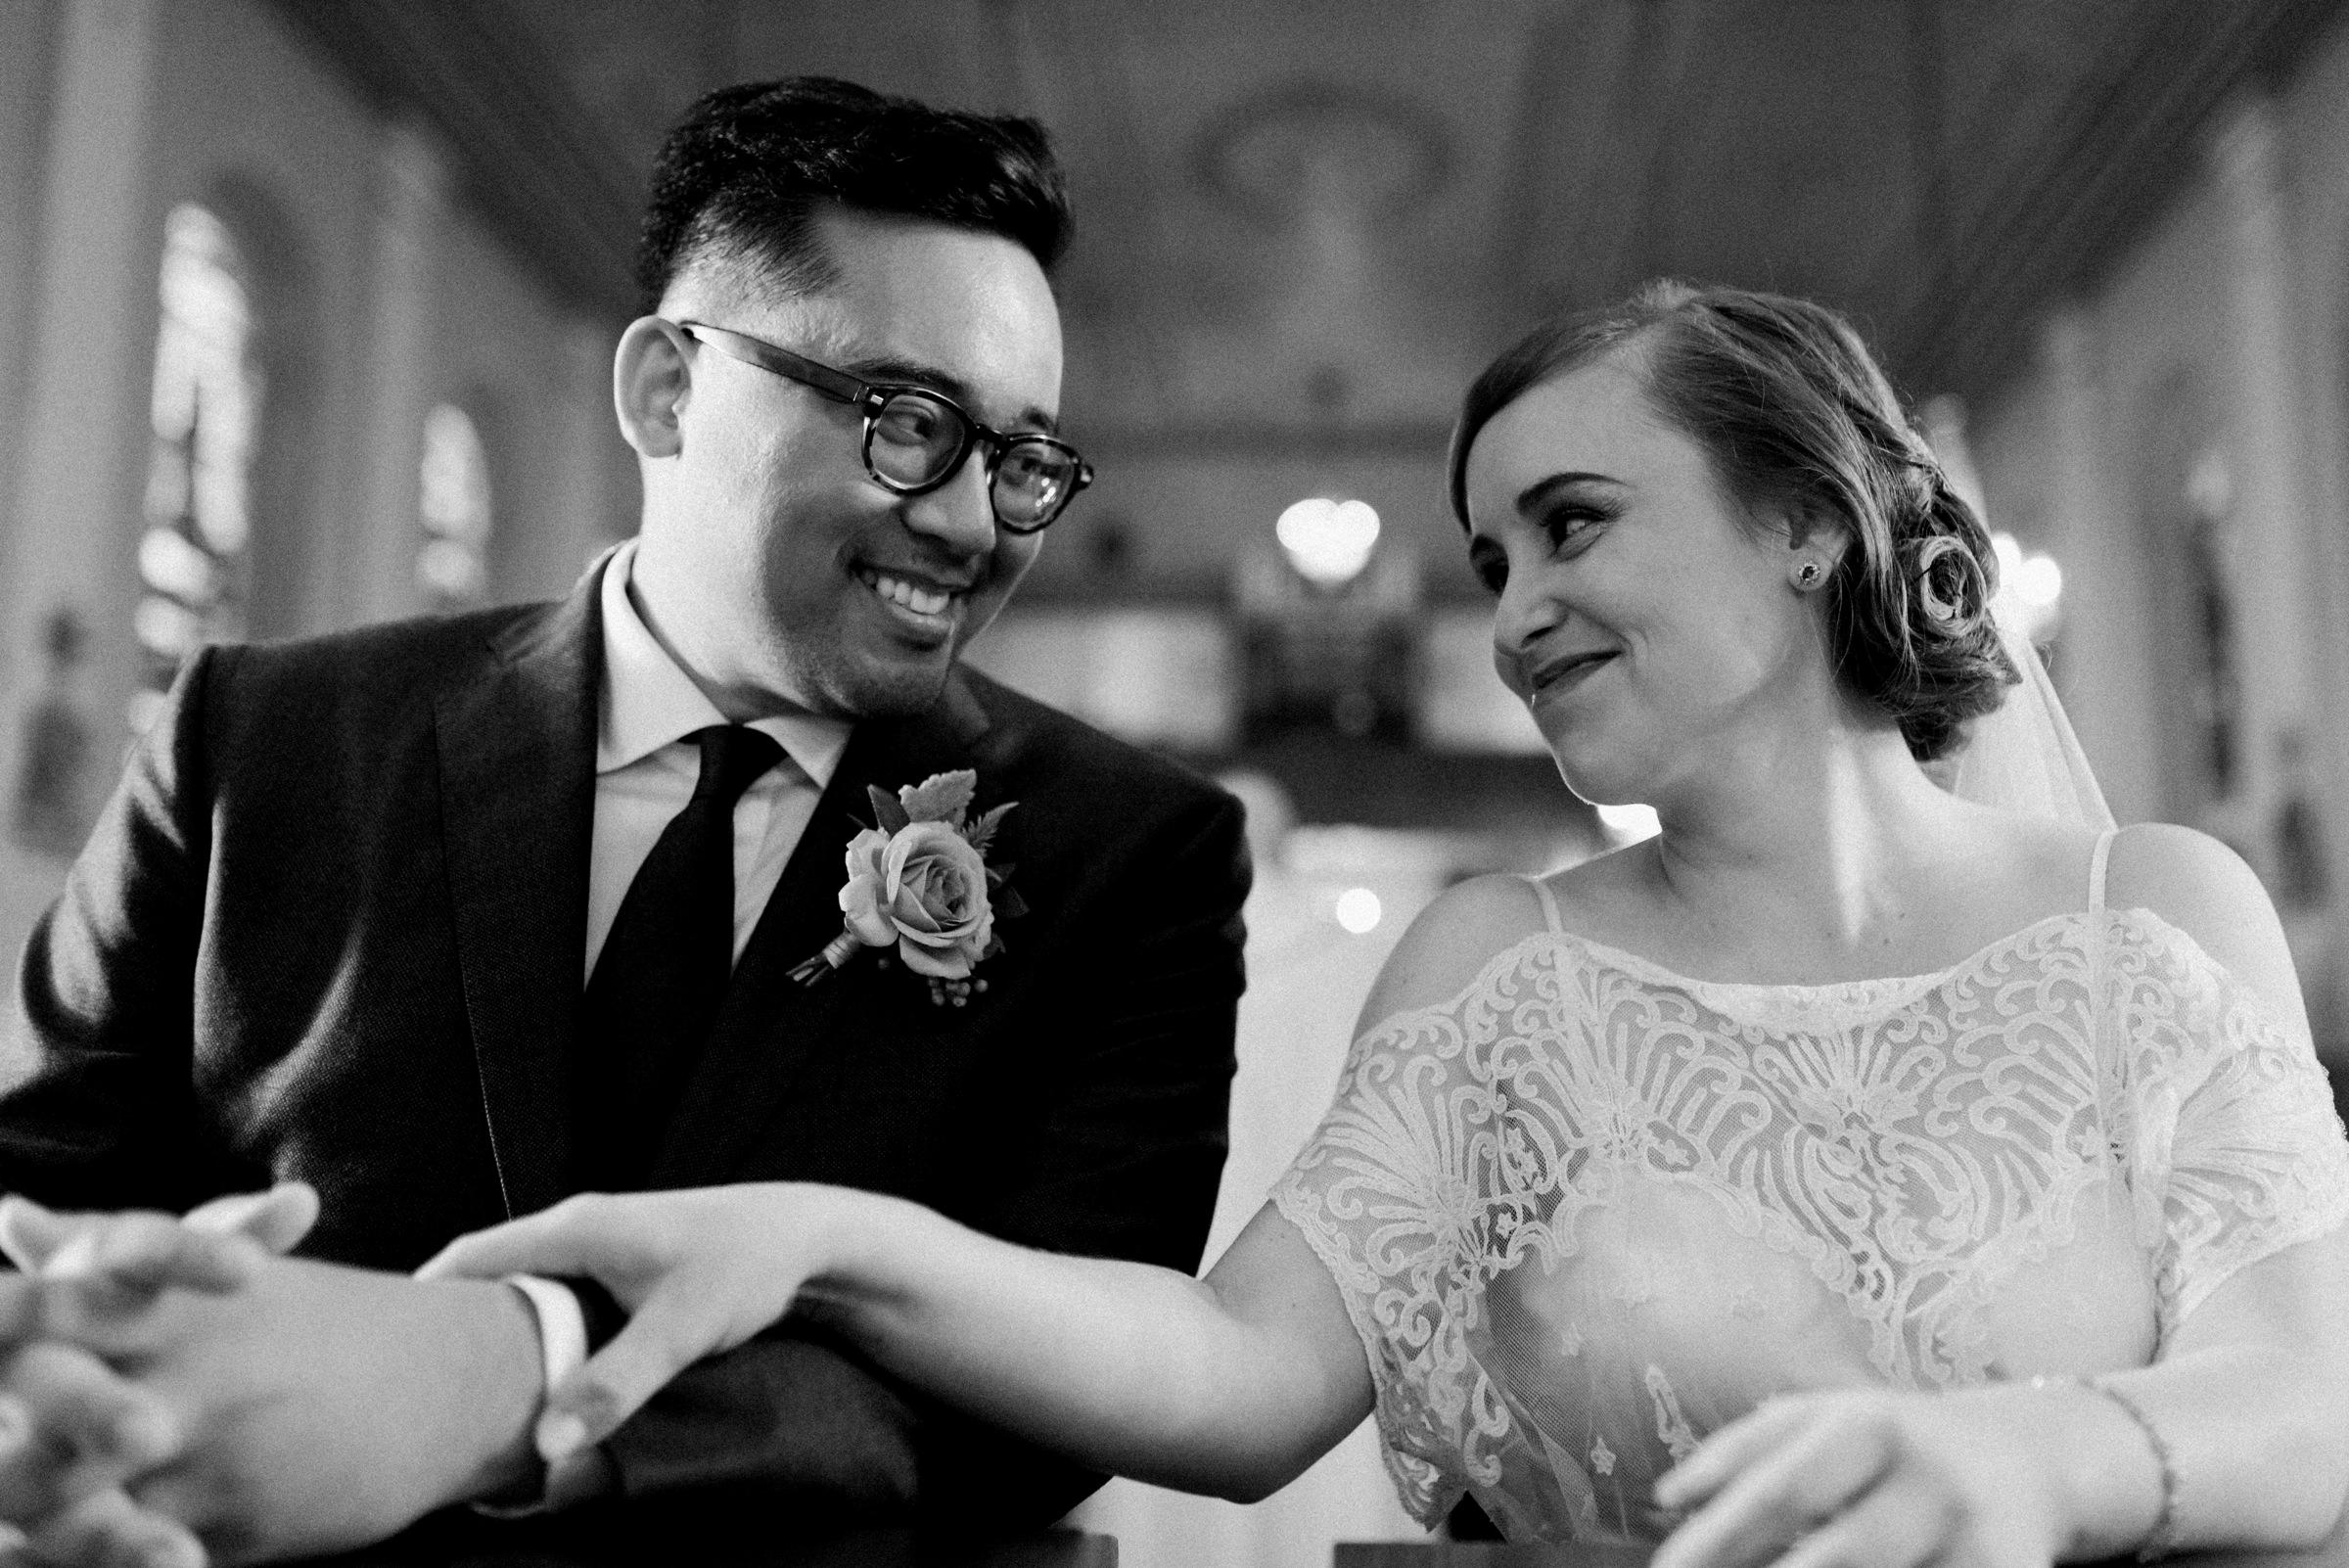 Smiling couple portrait - photo by Dark Roux